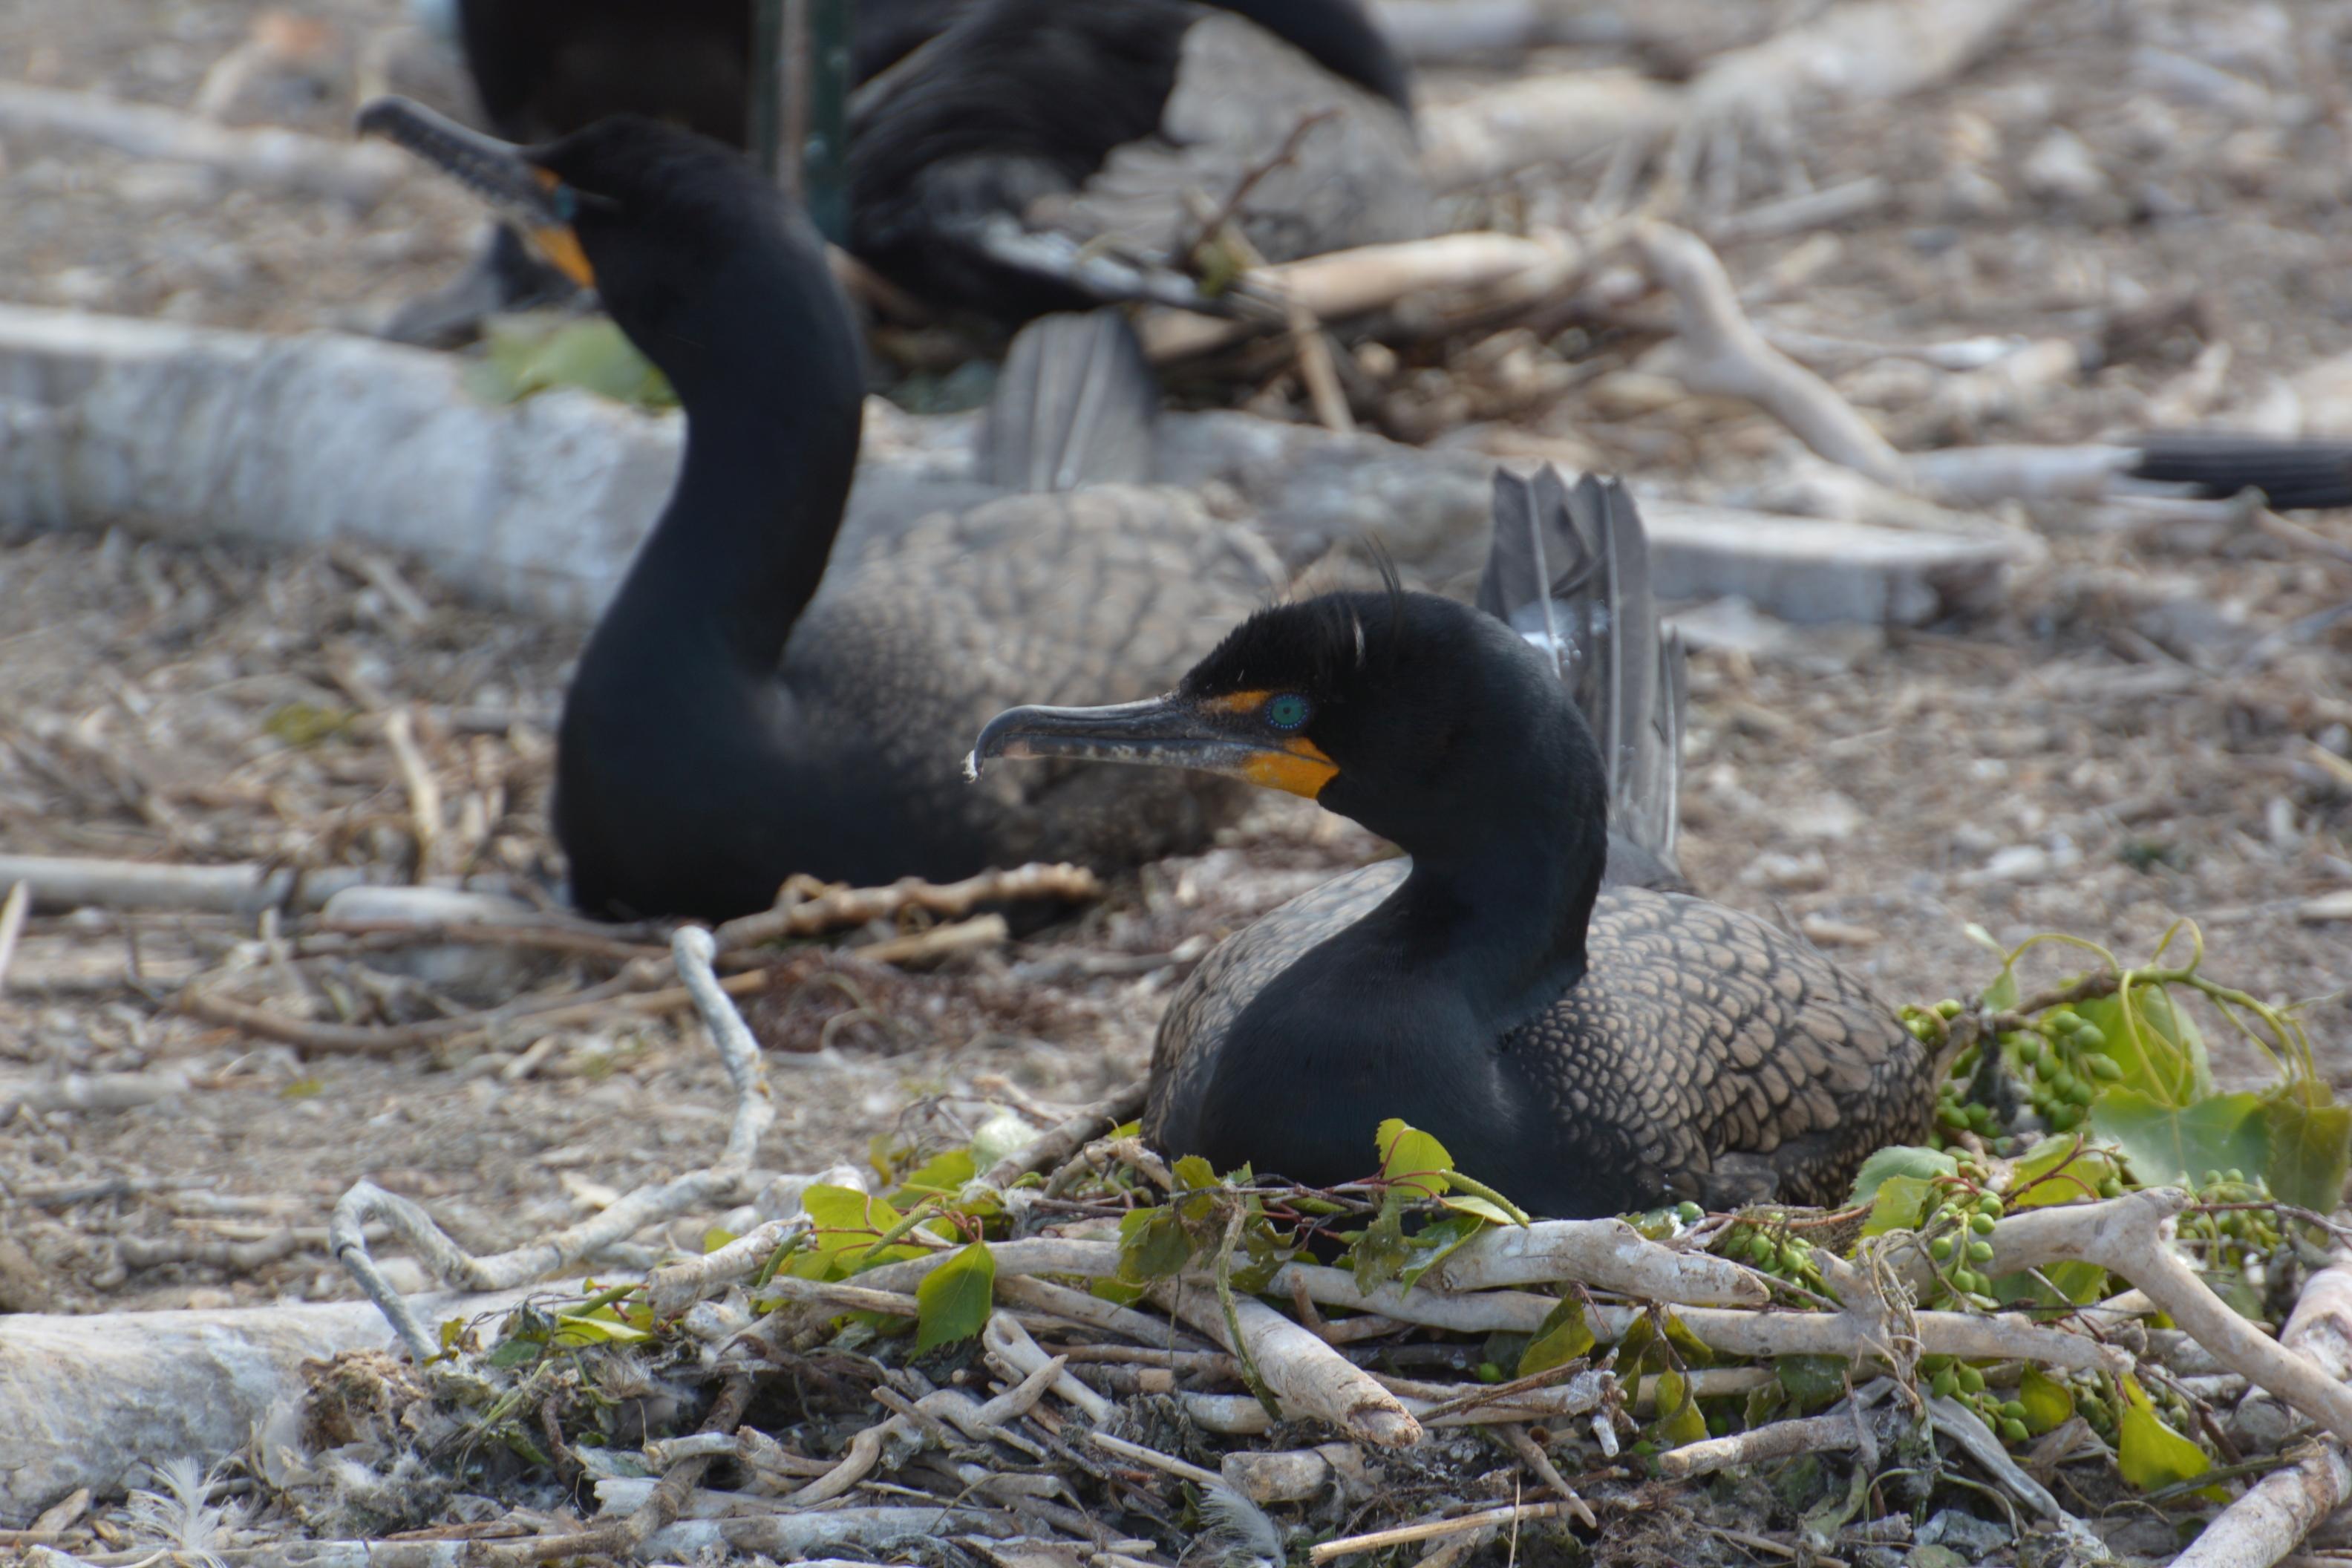 In Ontario, it's open season on cormorants. But is the hunt based on science?